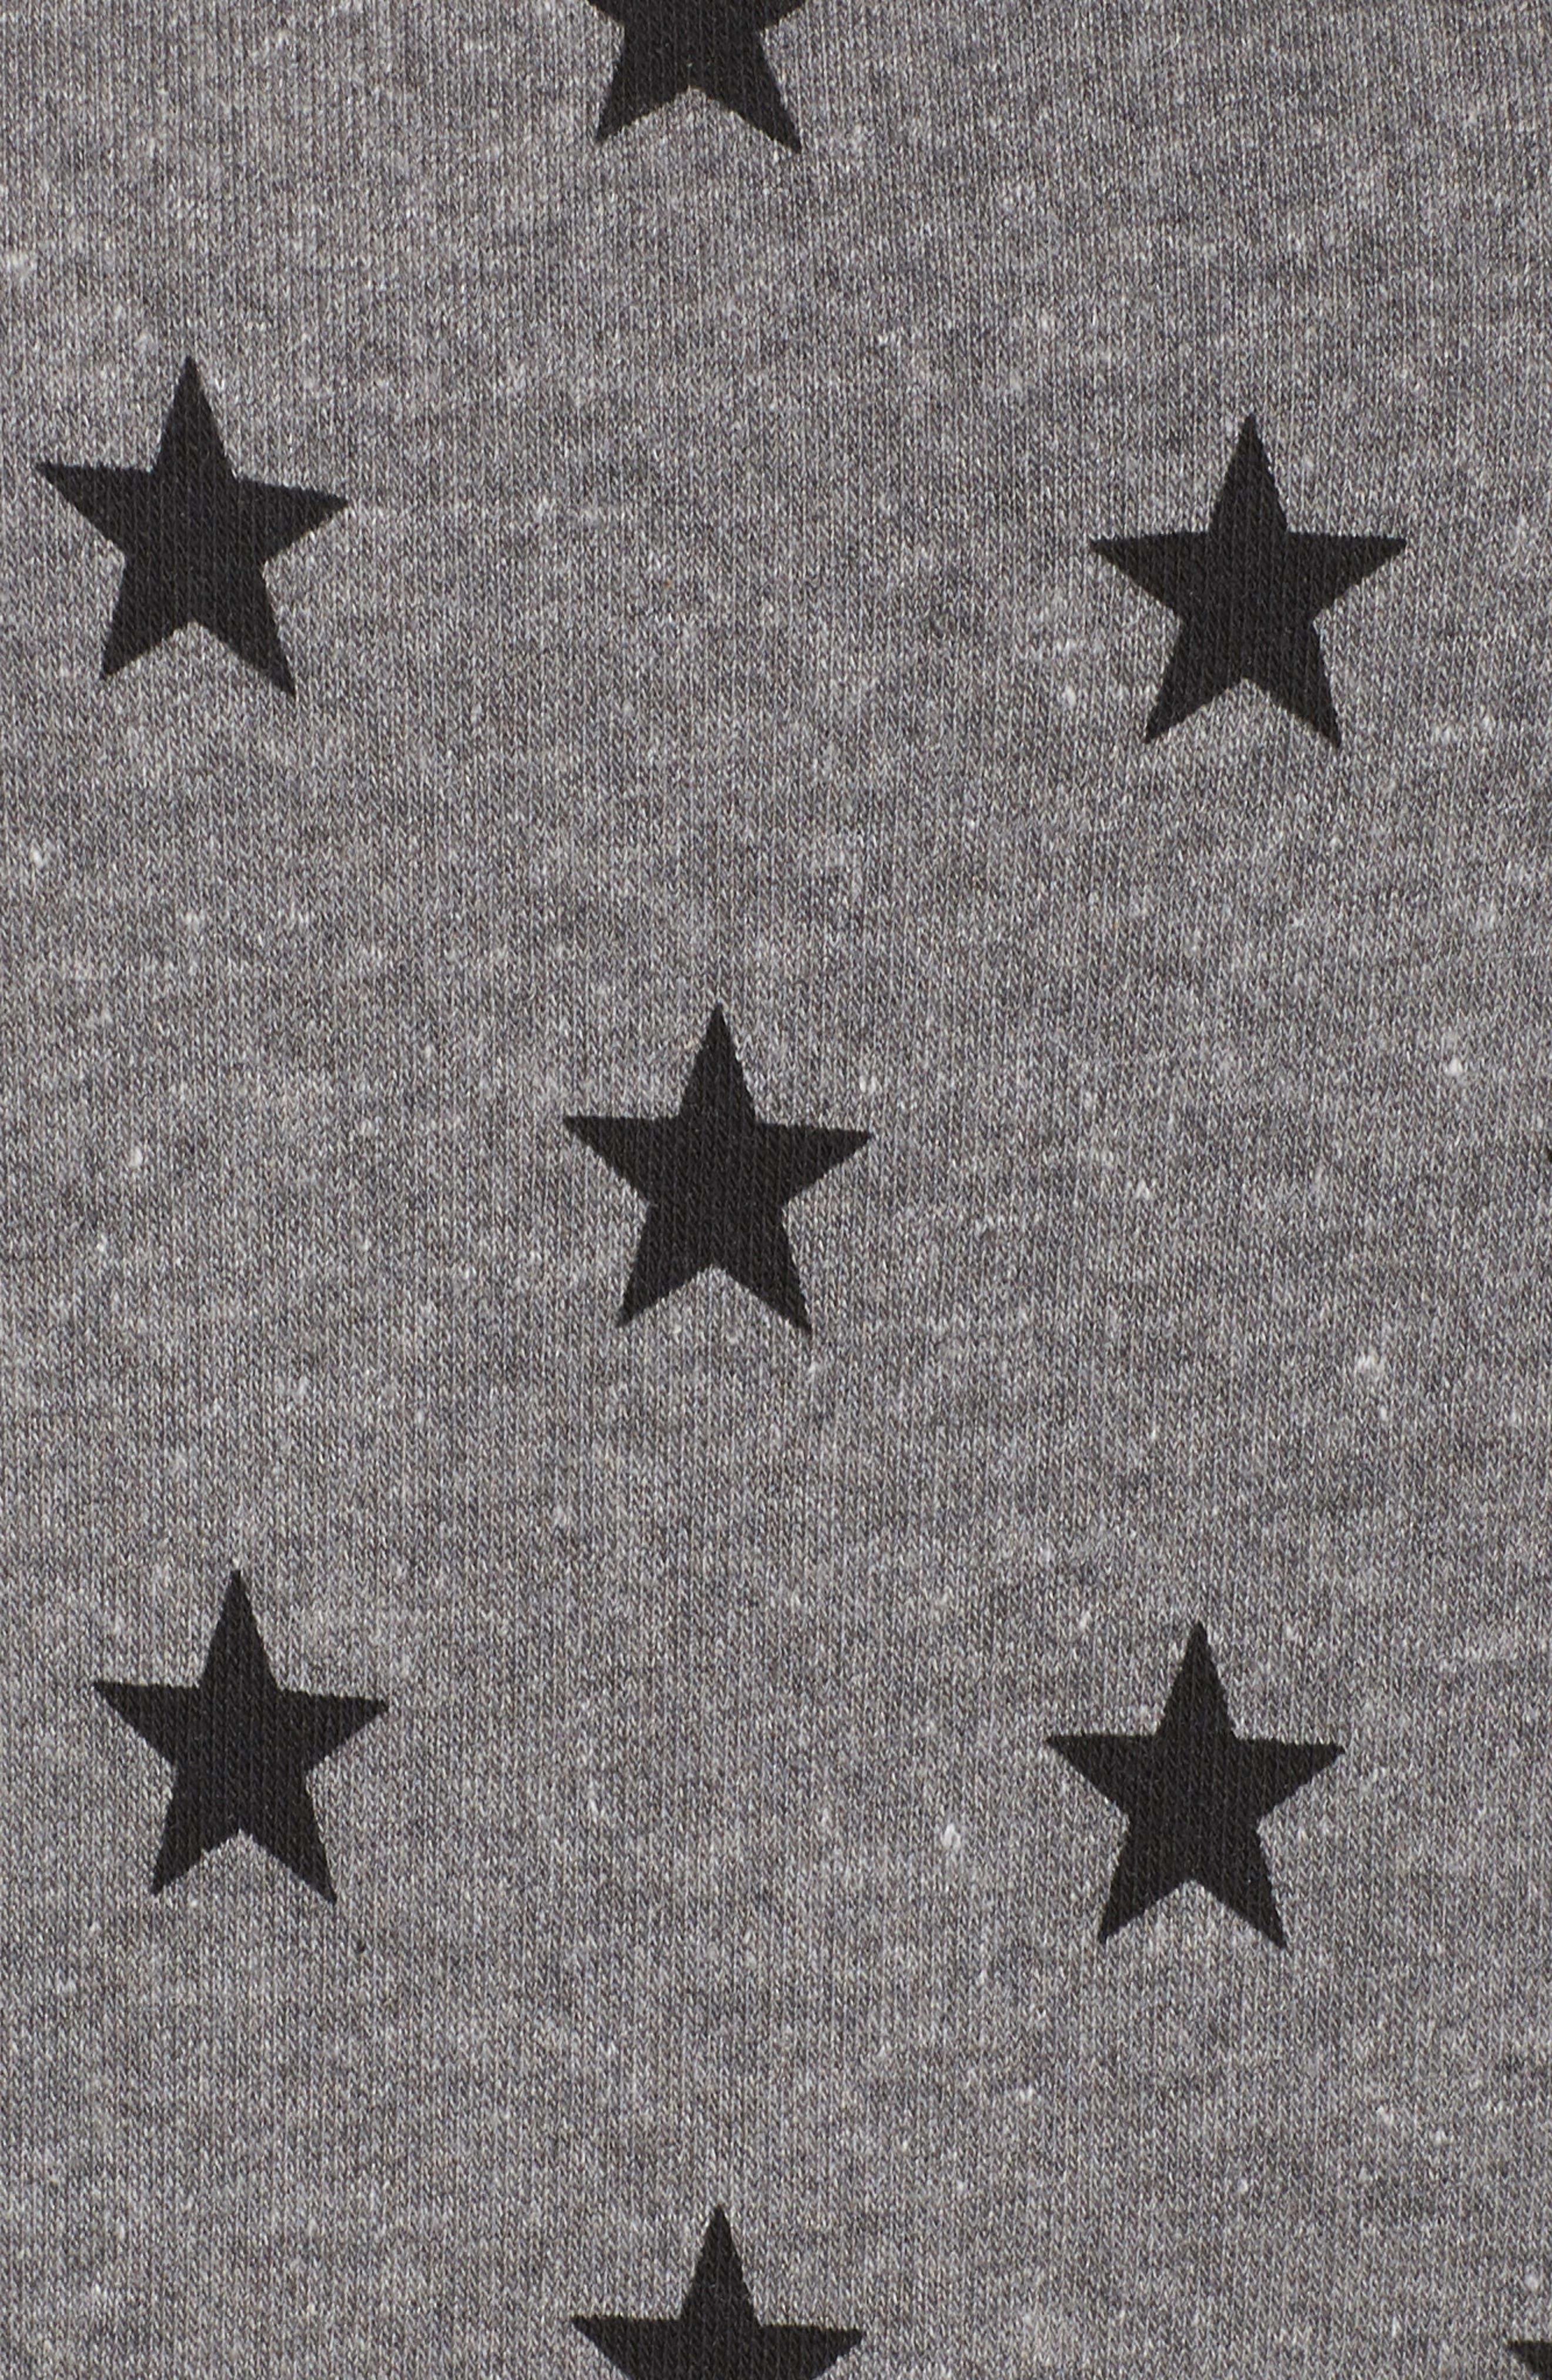 Maniac Camo Fleece Sweatshirt,                             Alternate thumbnail 5, color,                             089